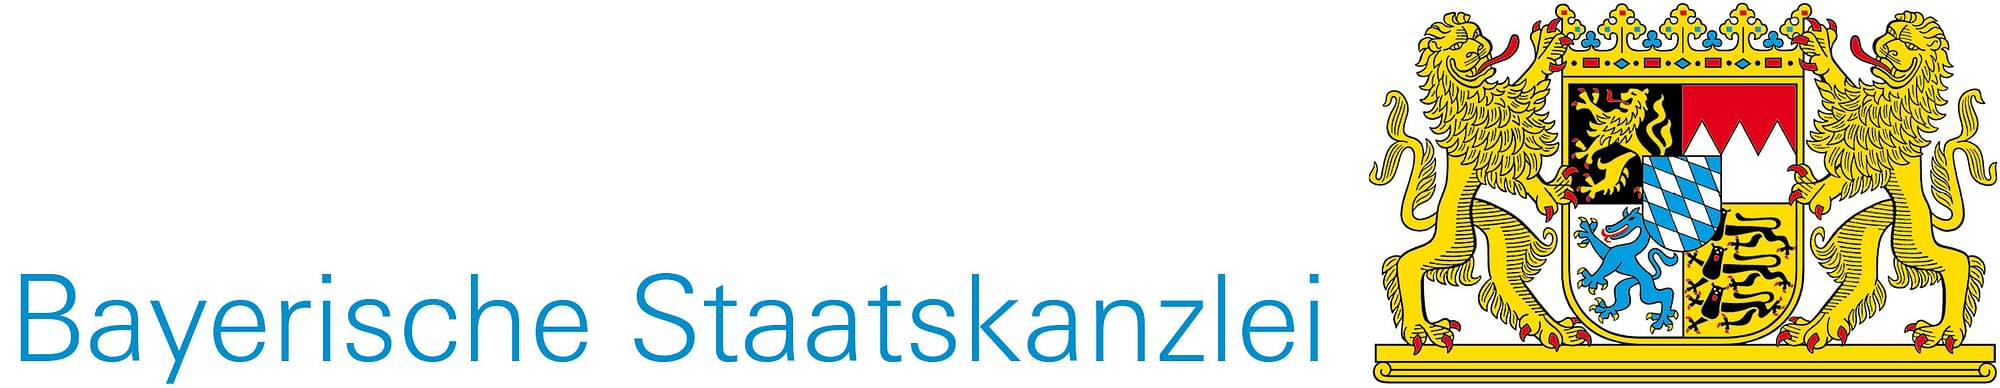 Staatskanzlei logo